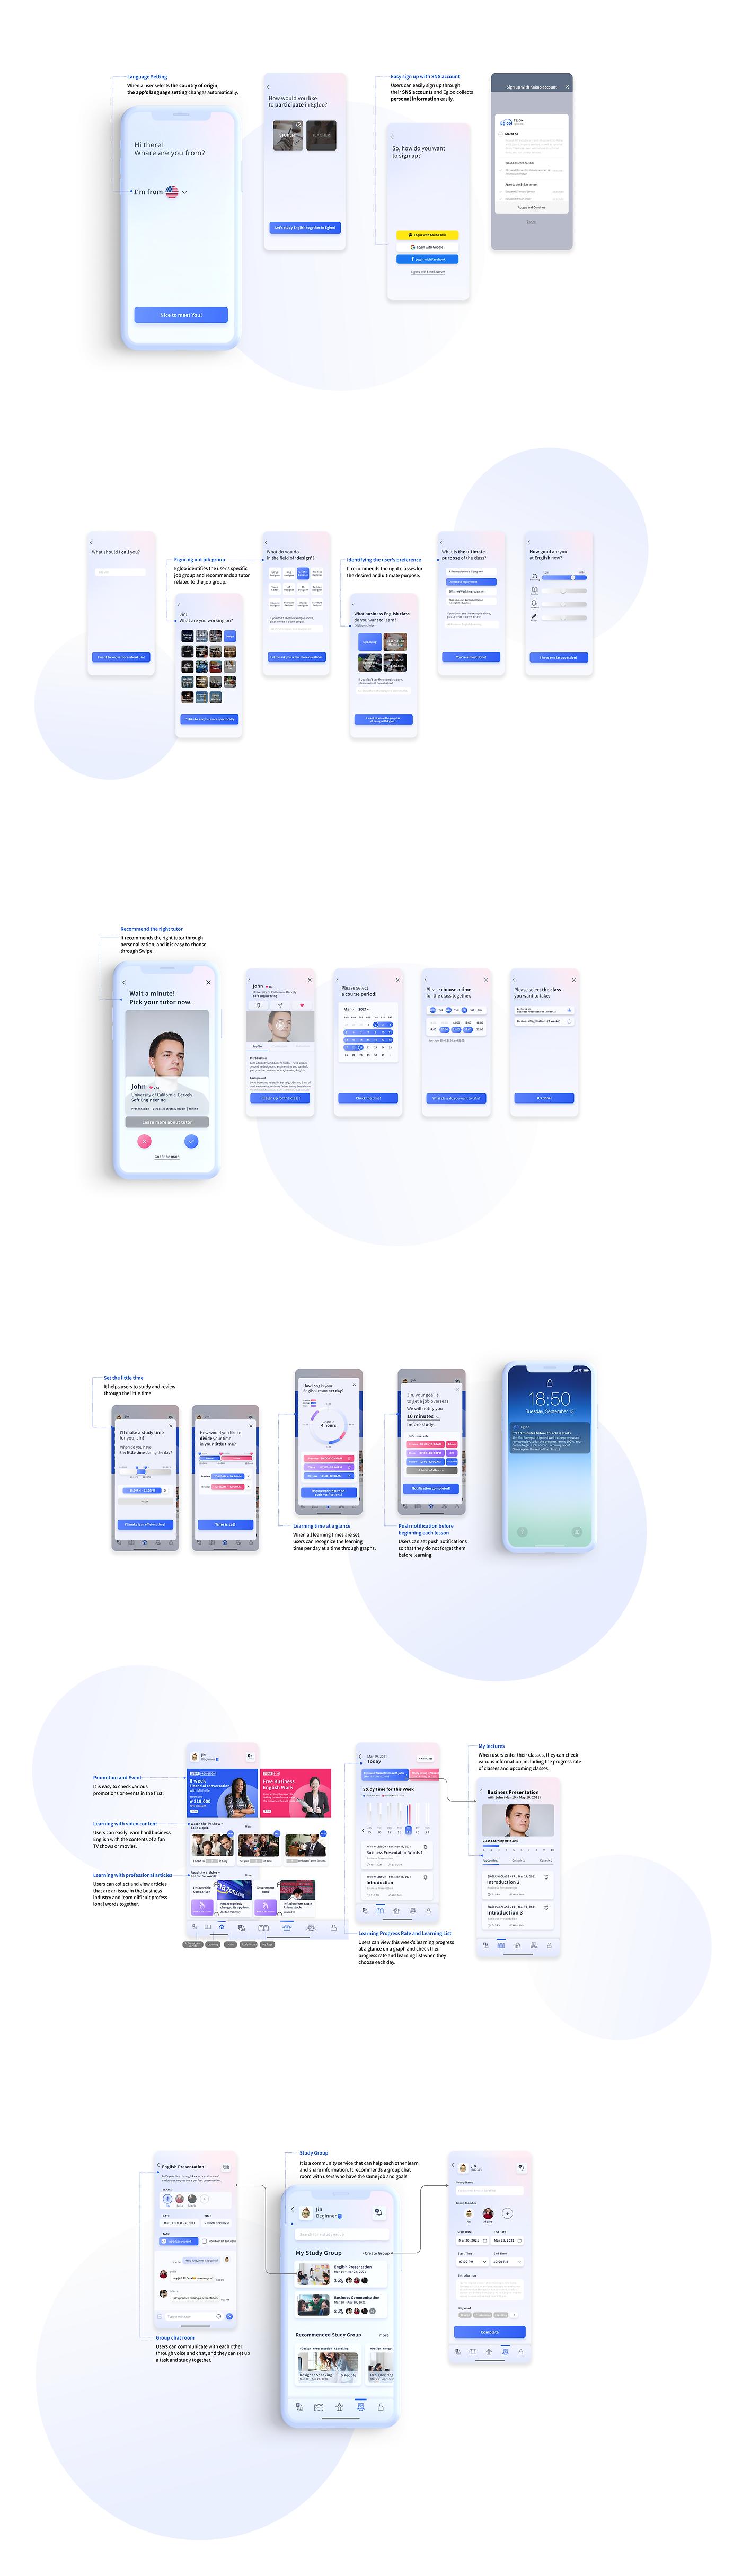 Design-Web-ver-2.png